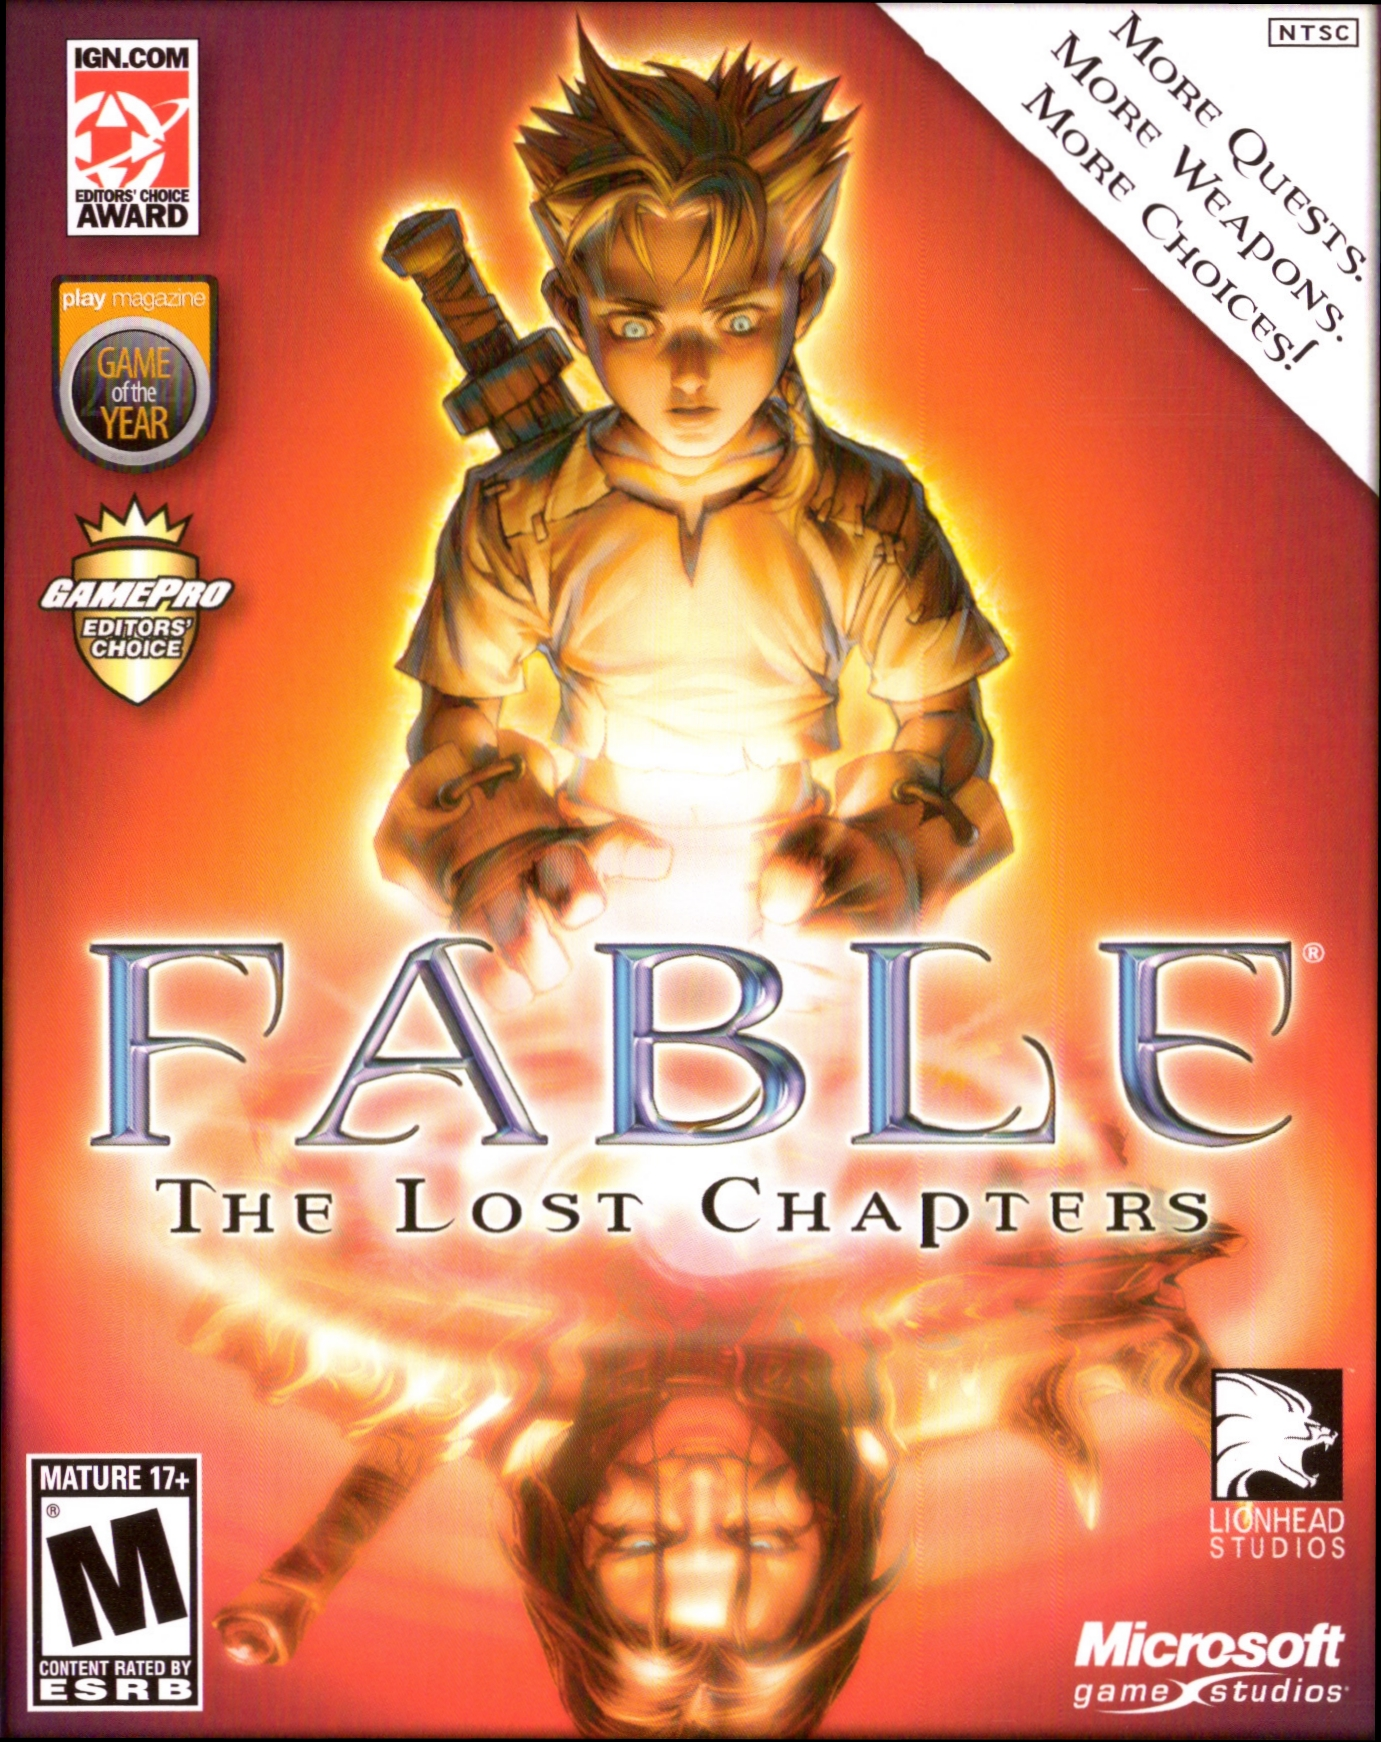 Plik:Fable TLC -PC- Box Art High Res.jpg